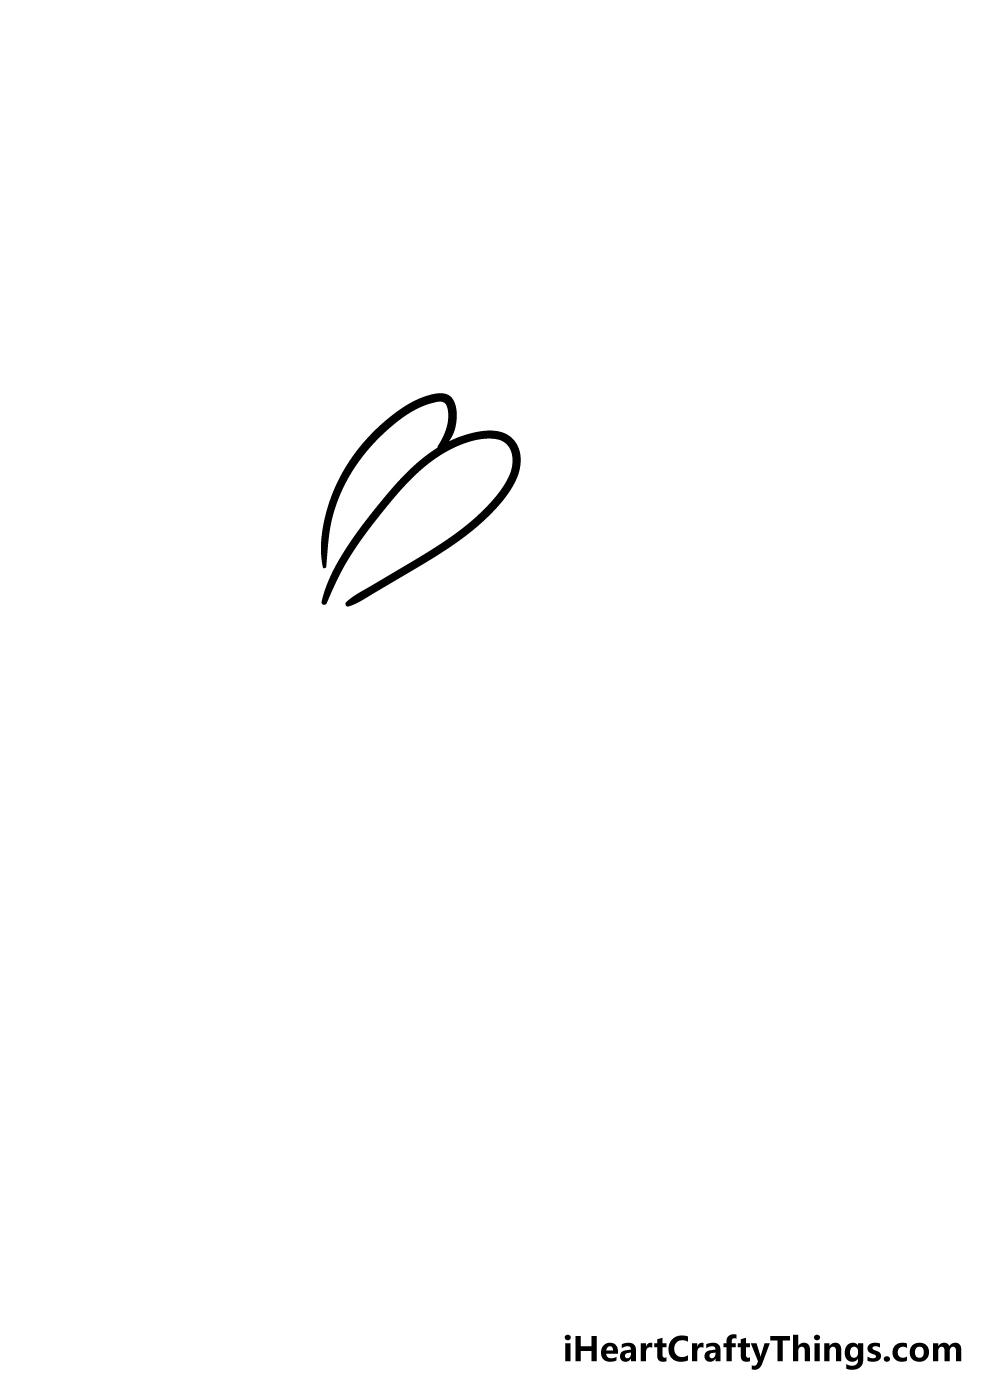 rabbit drawing step 2